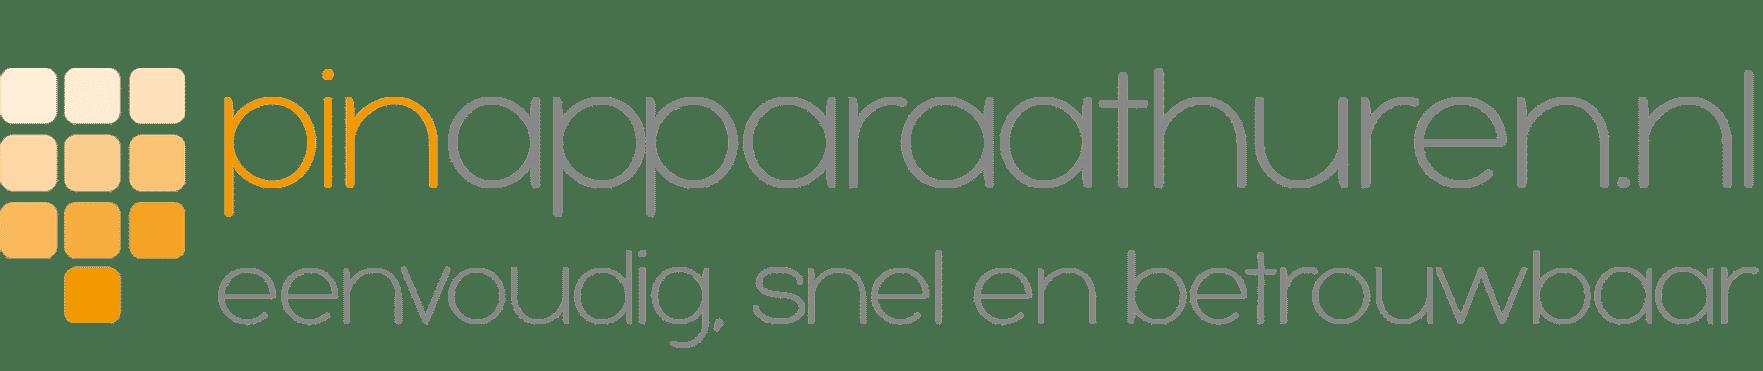 logo pinapparaathuren.nl